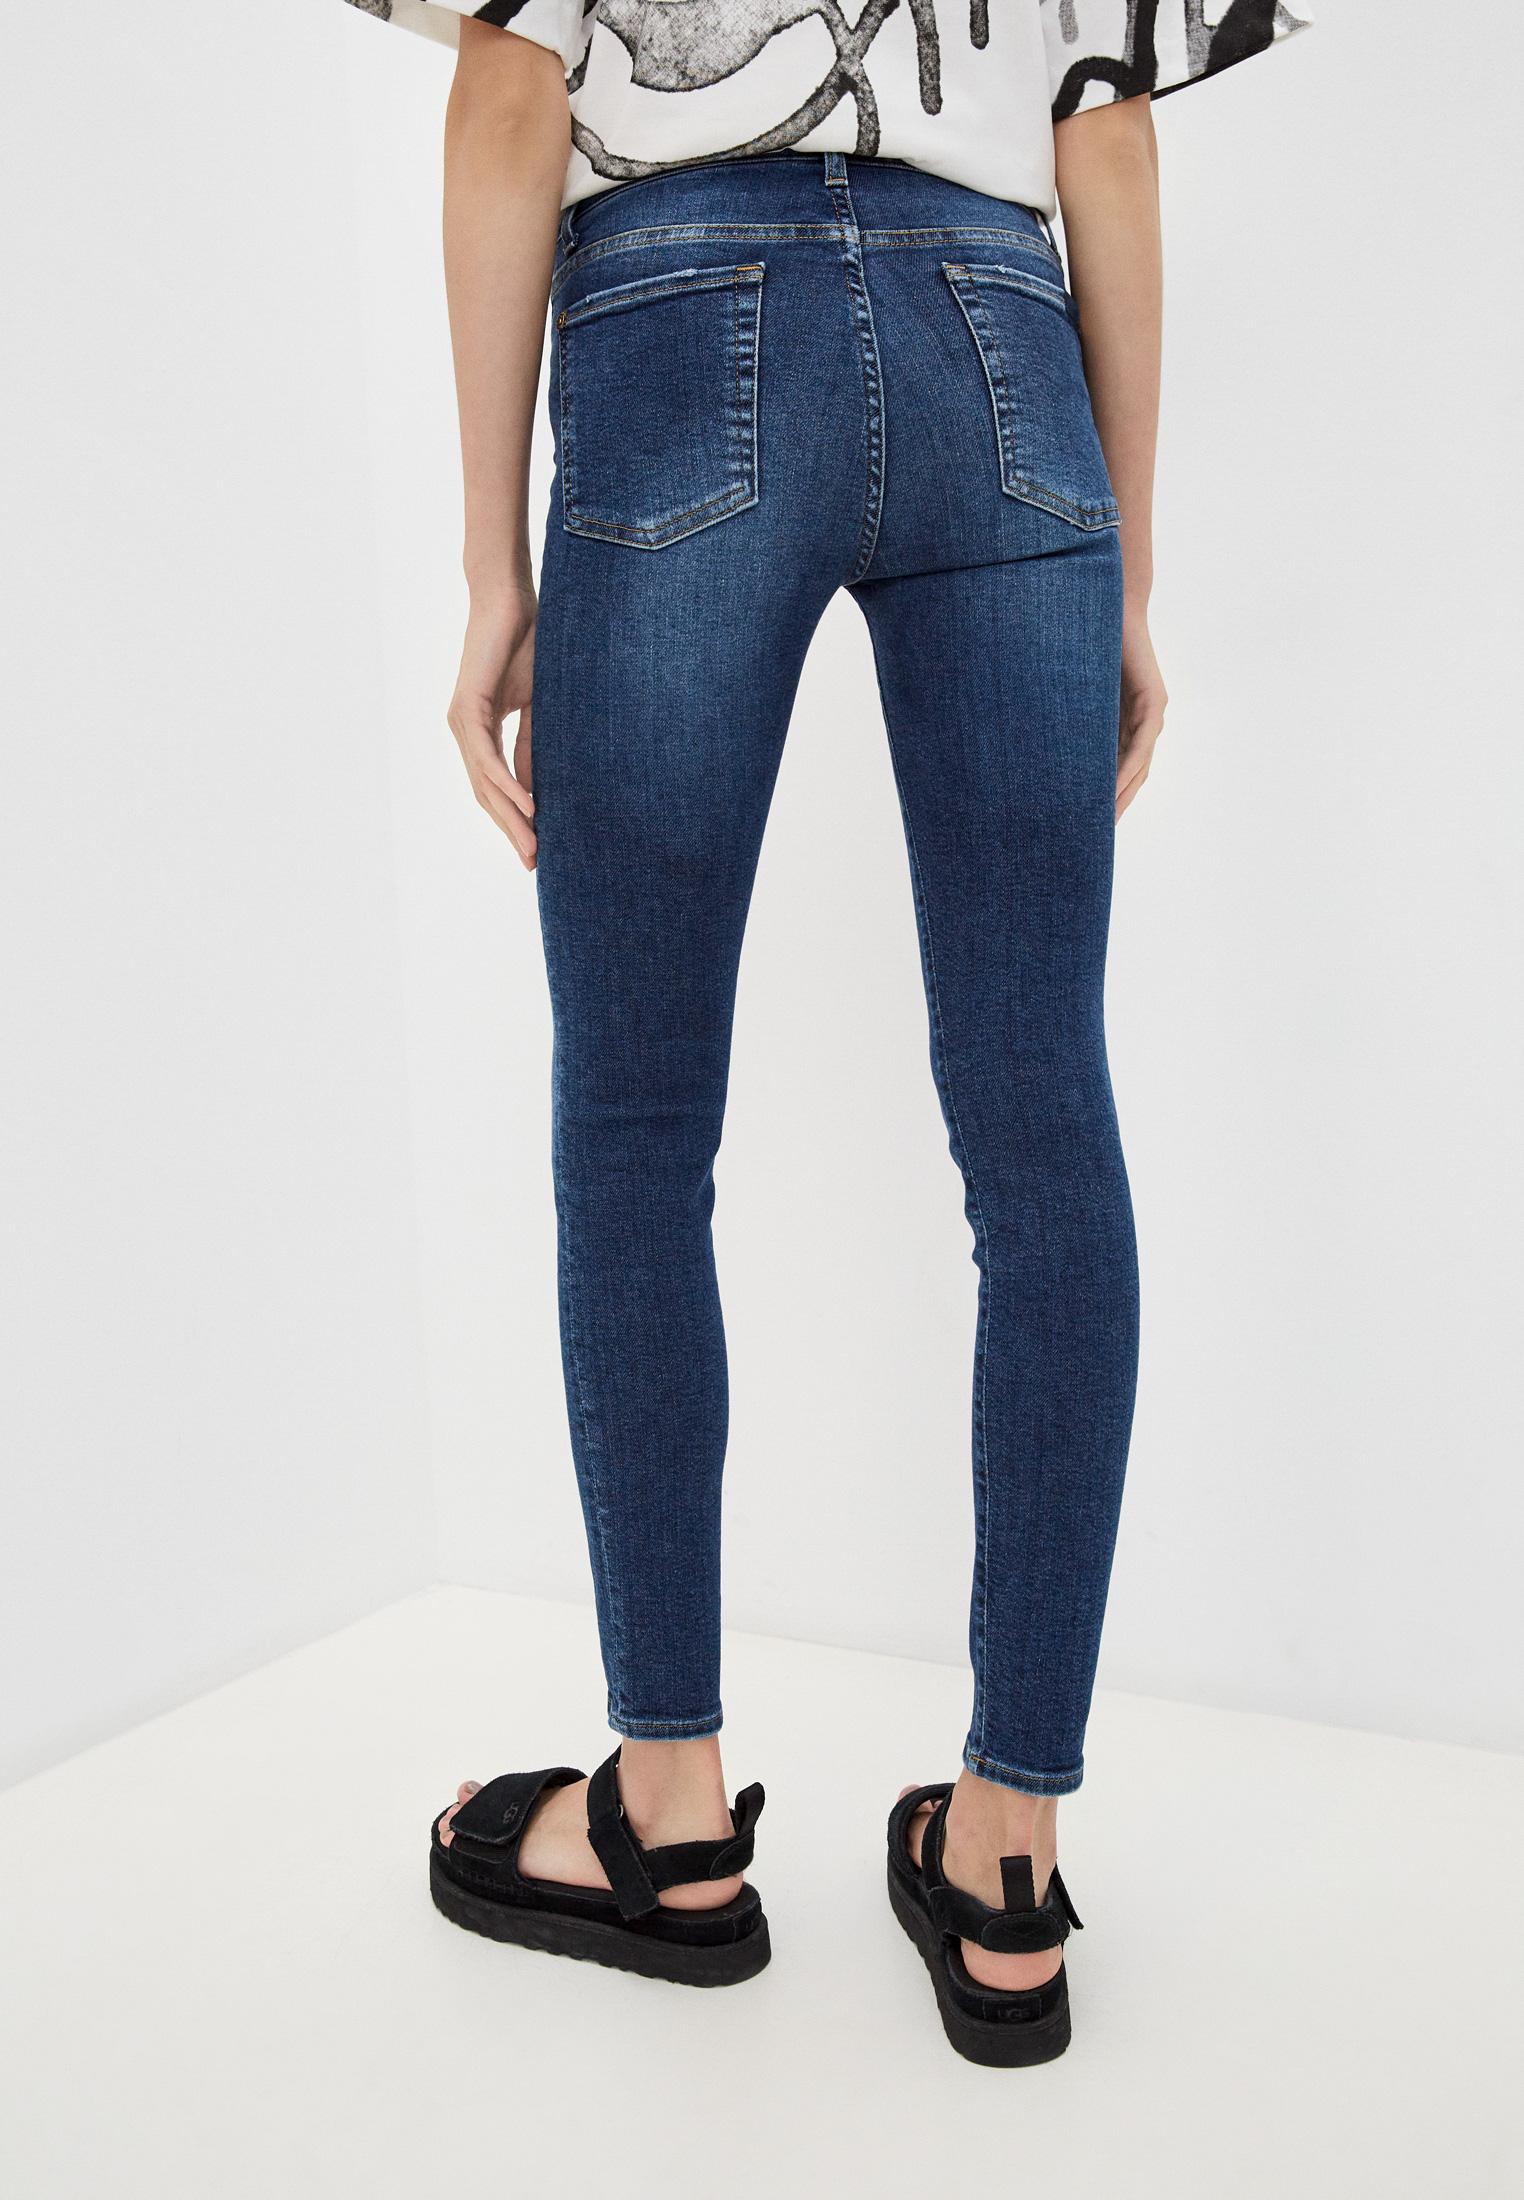 Зауженные джинсы 7 For All Mankind (7 Фо Олл Мэнкайнд) JSWZB740SA: изображение 4